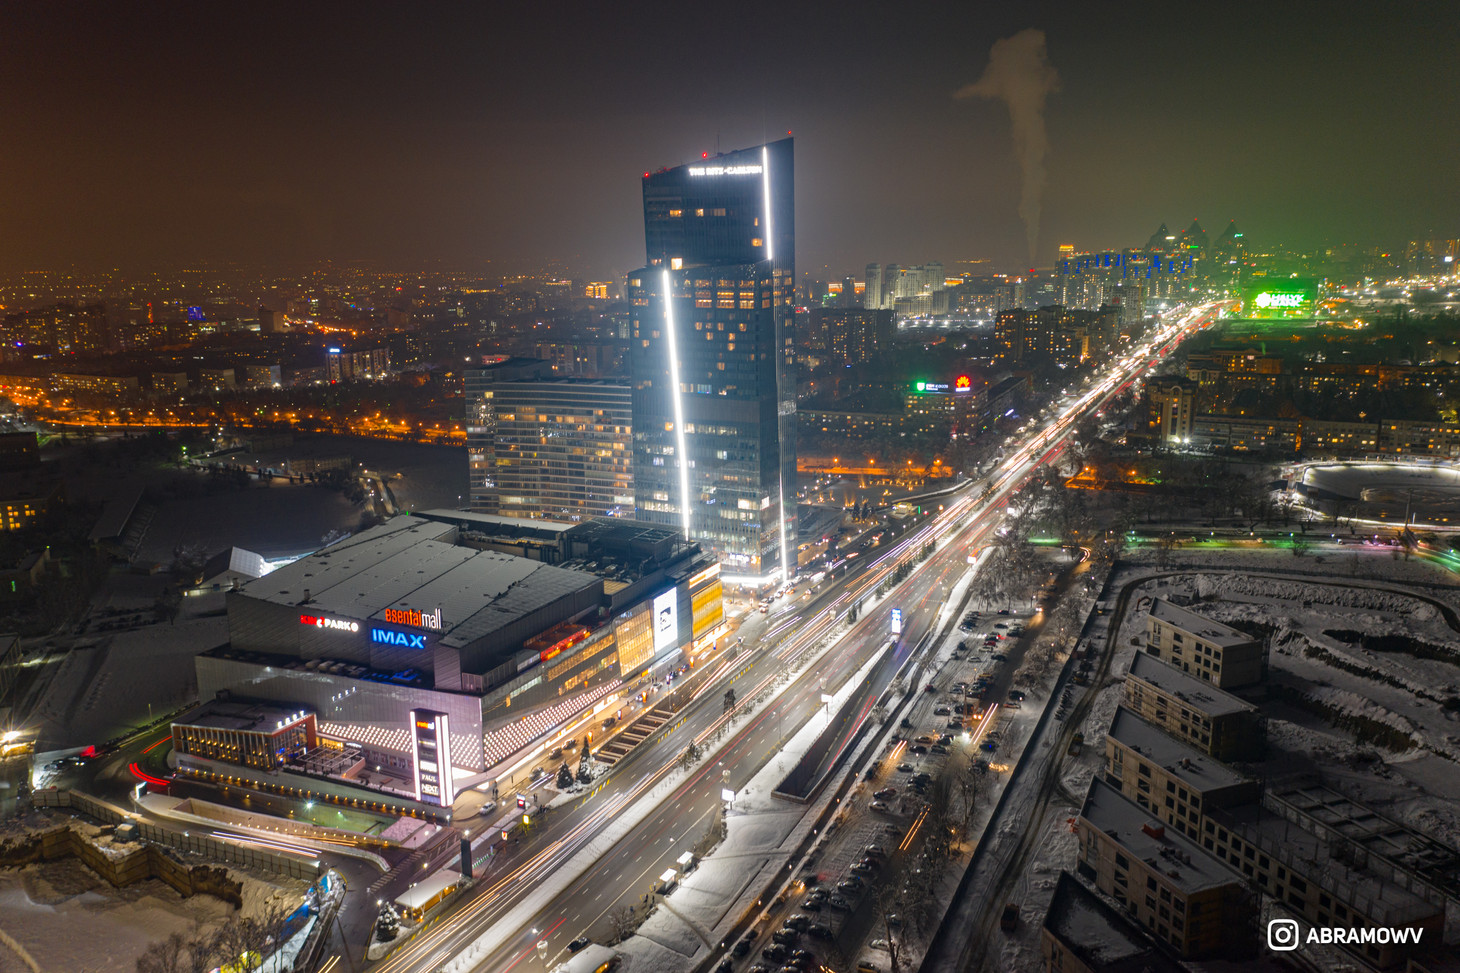 Esentai mall Almaty